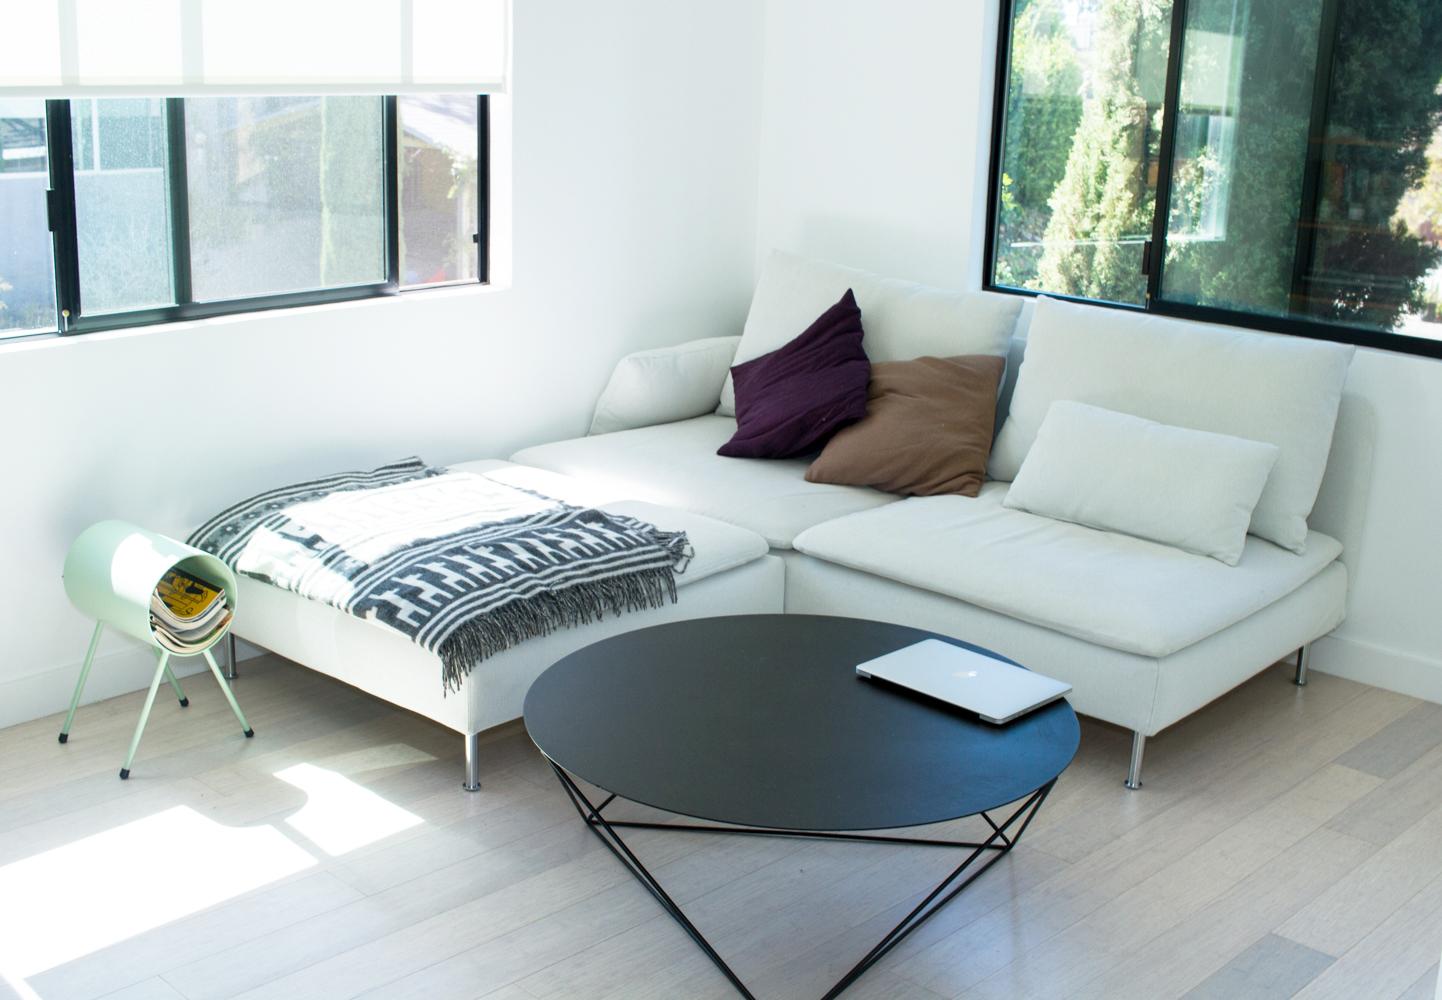 Coffee Table, Eric Trine    ;    Magazine Holder, Eric Trine    ;    Couch, Ikea